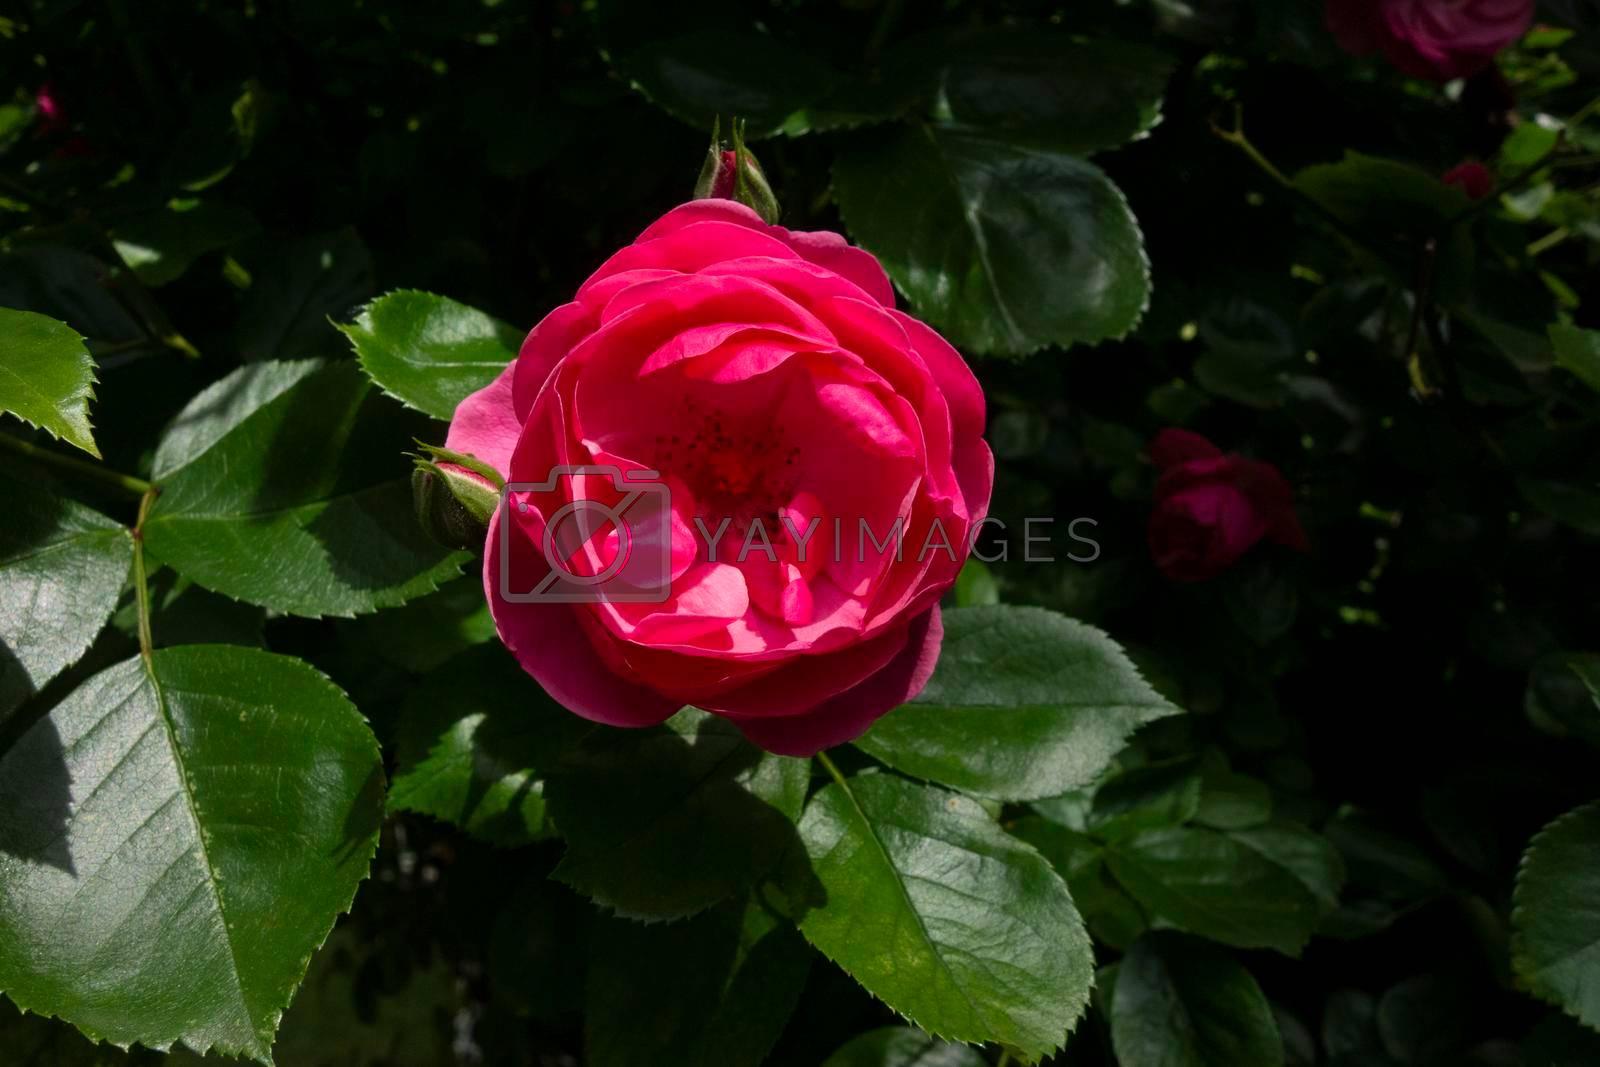 blooming rose flowers as ornamental plants in a rose garden